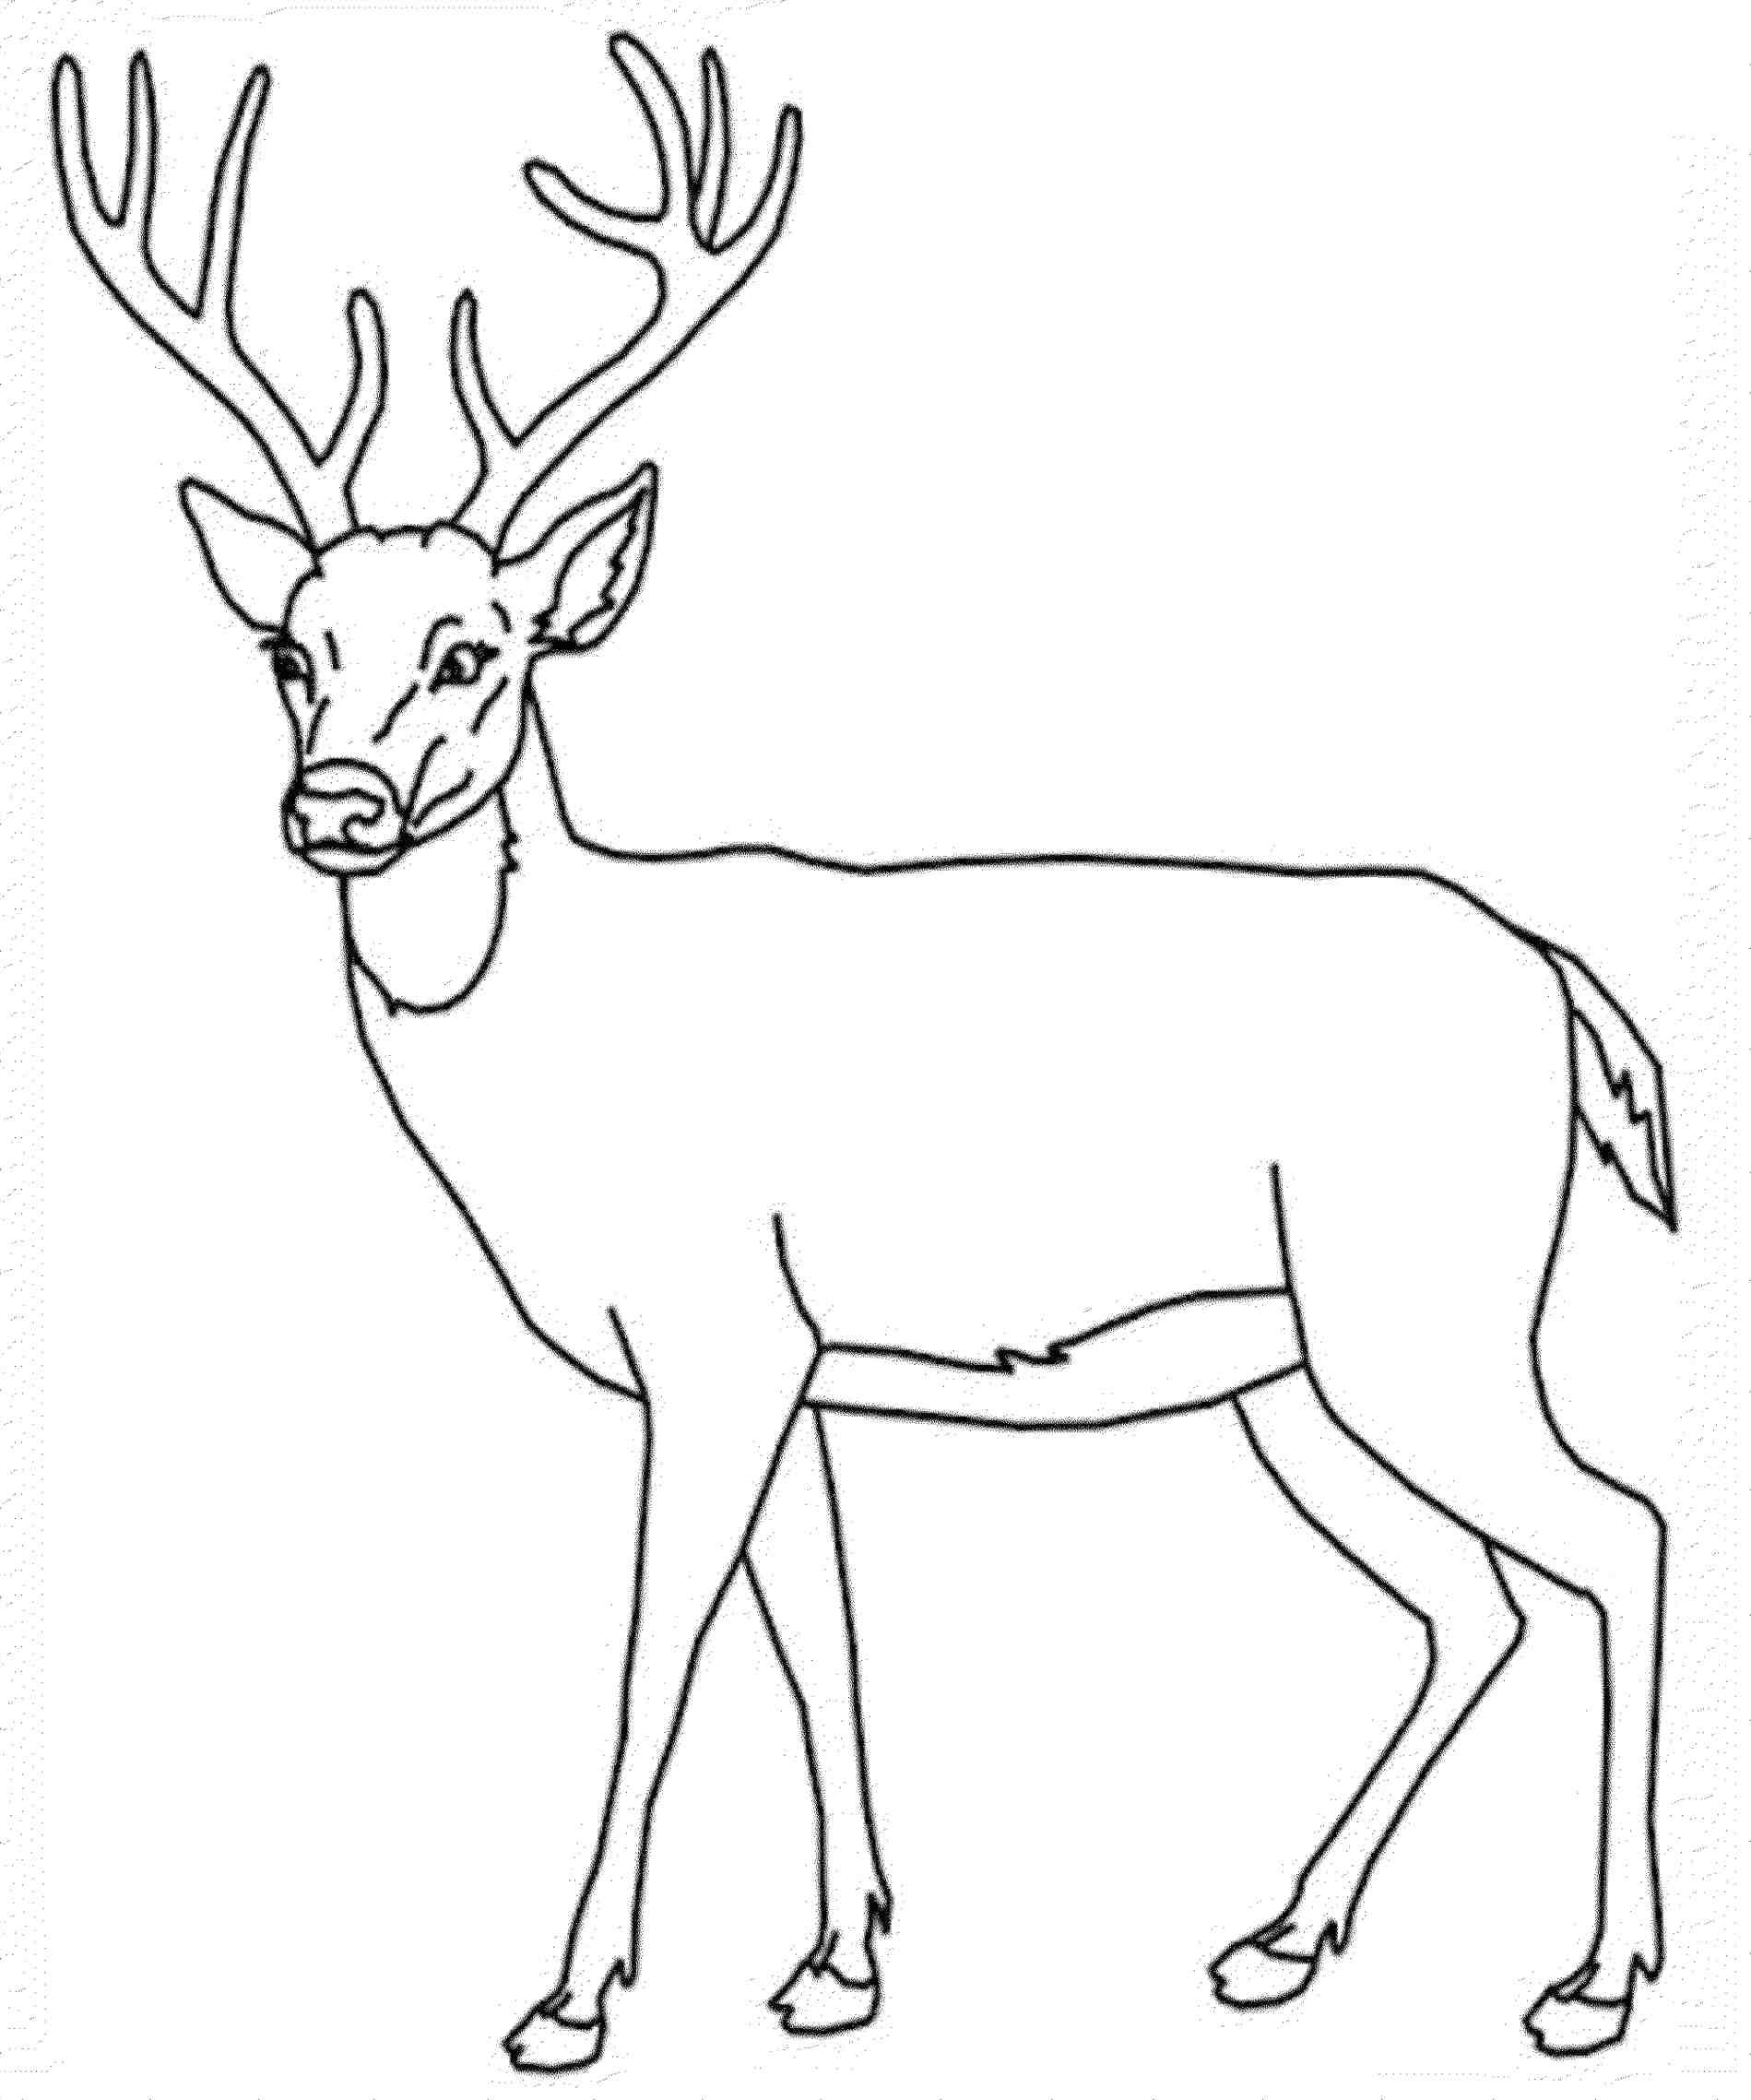 Baby Reindeer Coloring Pages at GetDrawings | Free download